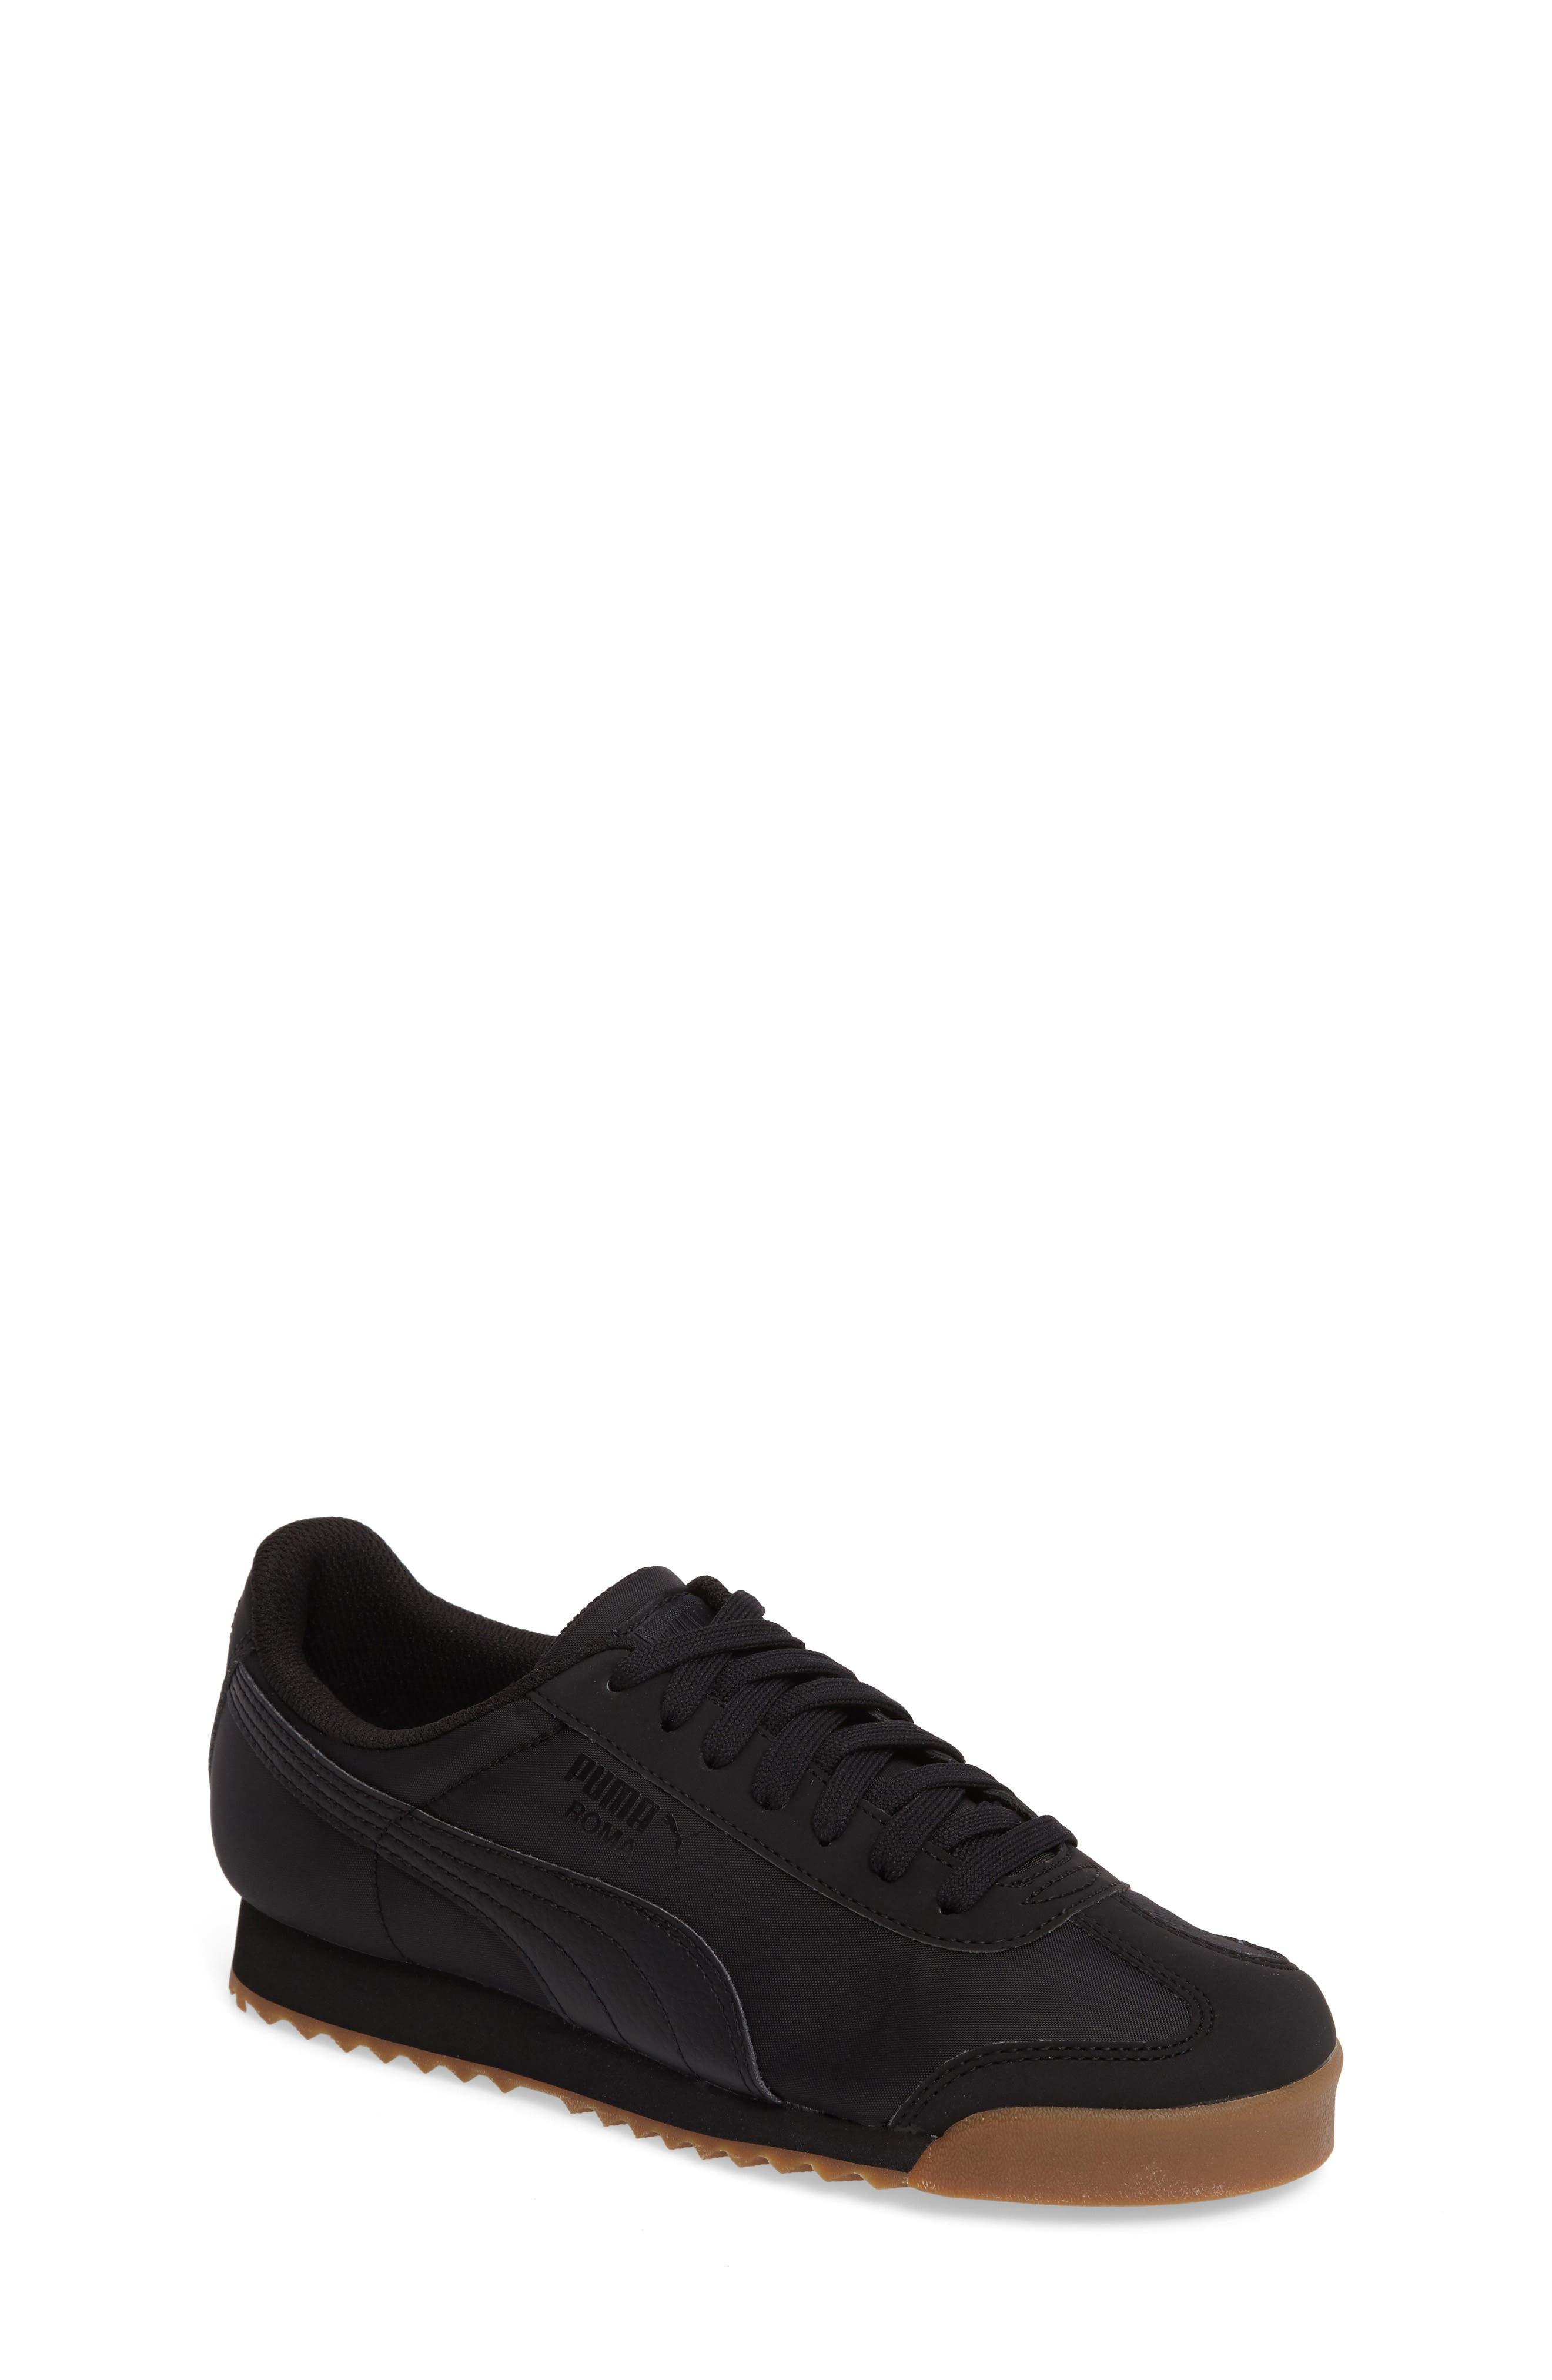 PUMA Roma Basic Summer Sneaker, Main, color, 001